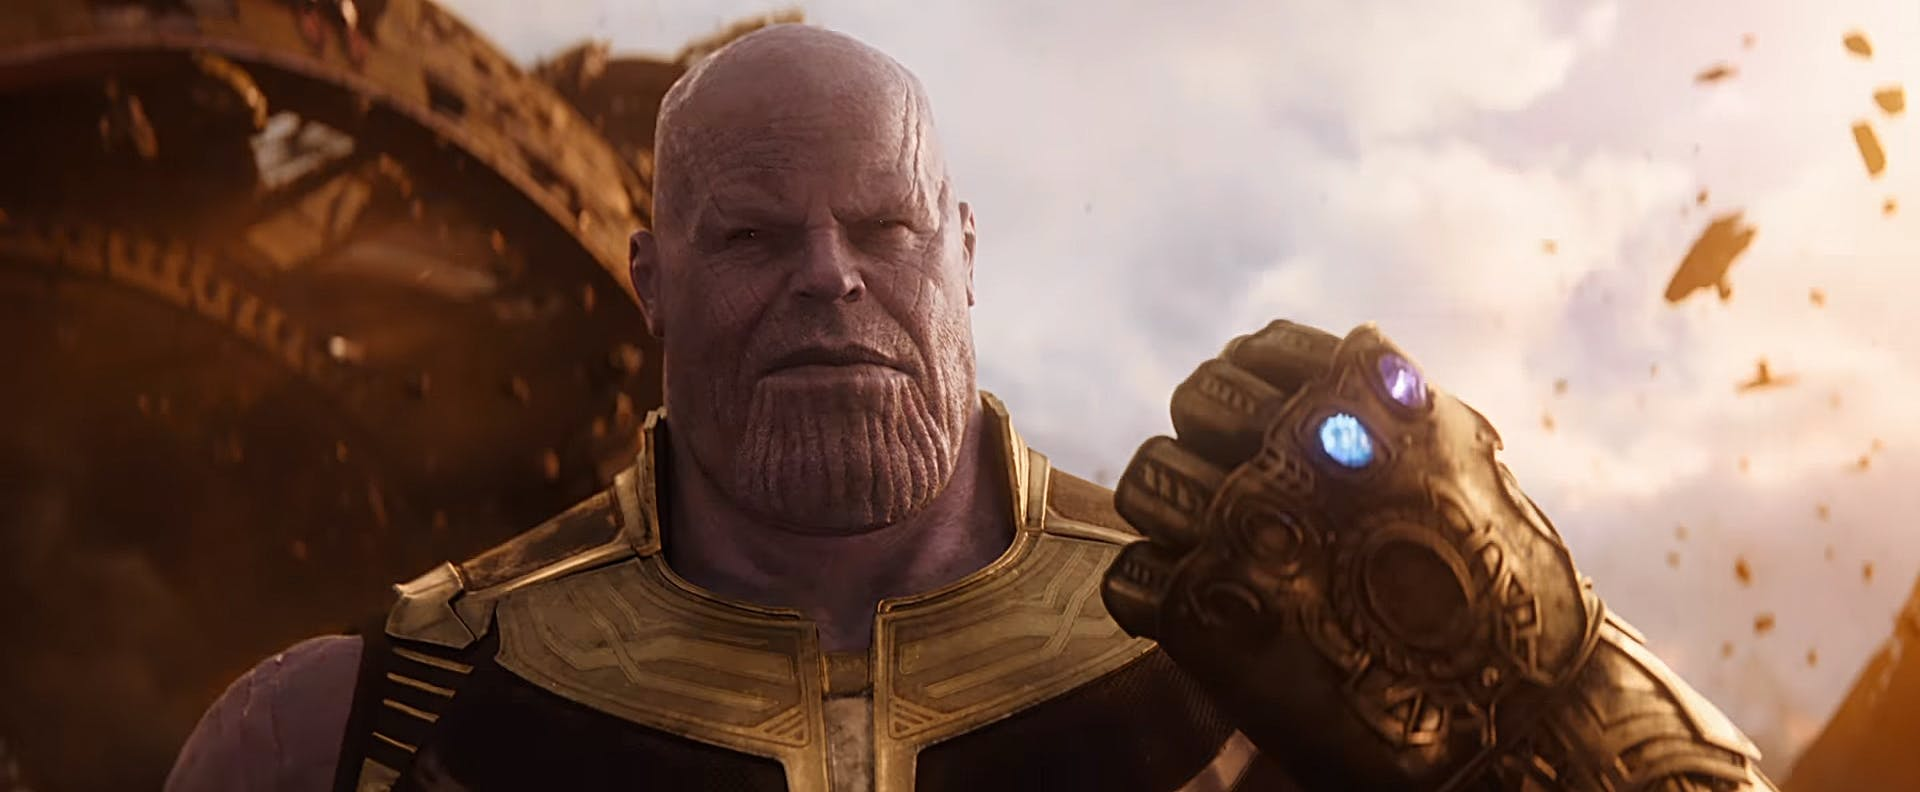 mcu phase 4 - Thanos Infinity War